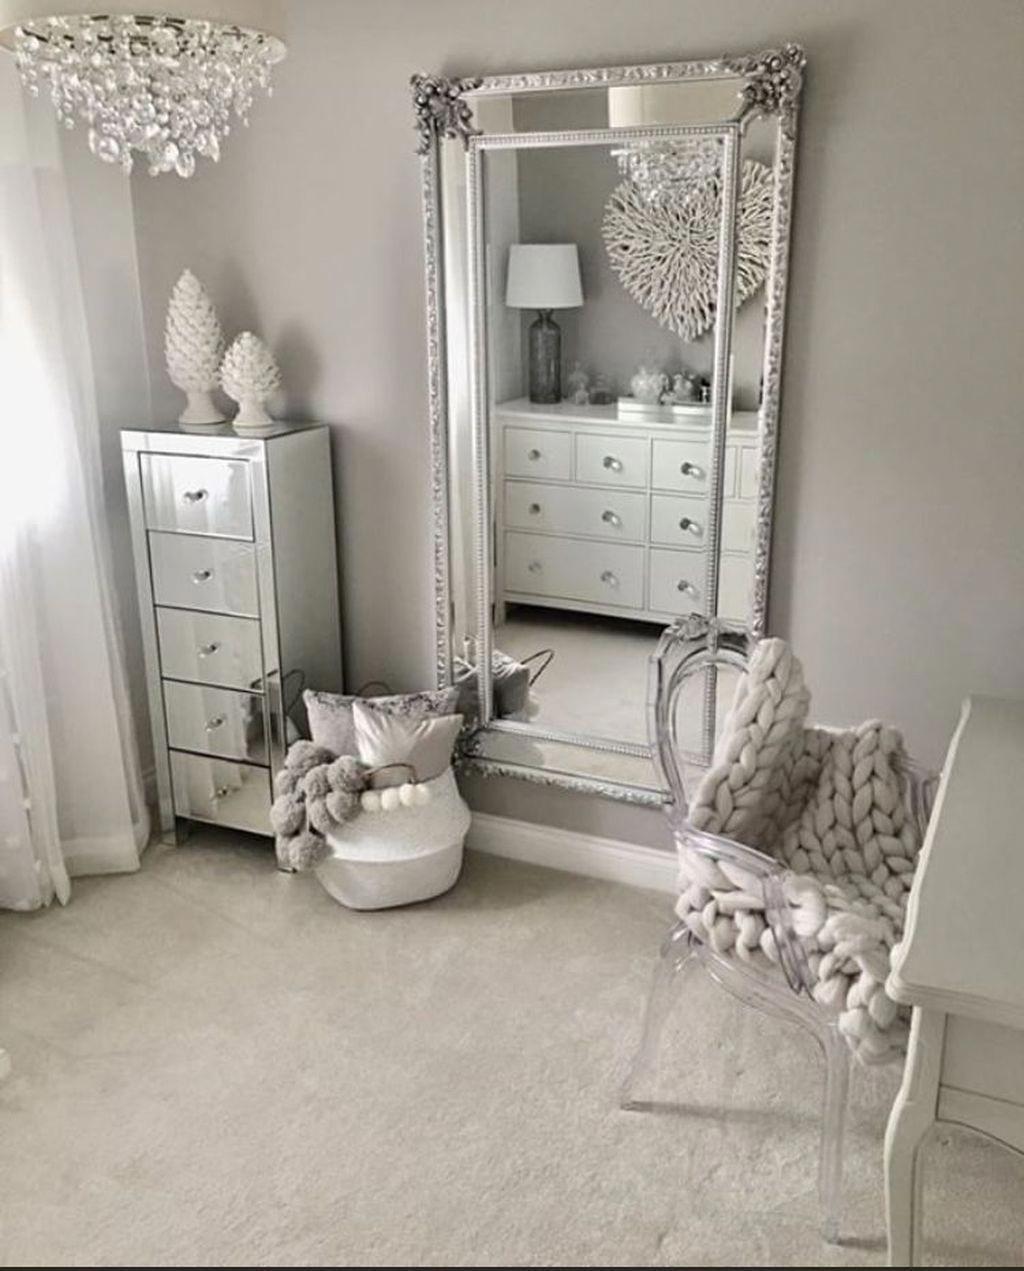 Grey Bedroom Ideas Top 10 Relaxing Grey Bedroom Ideas That You Will Adore Leading 10 Delightful Grey Bedroo Stylish Bedroom Bedroom Decor Beautiful Bedrooms